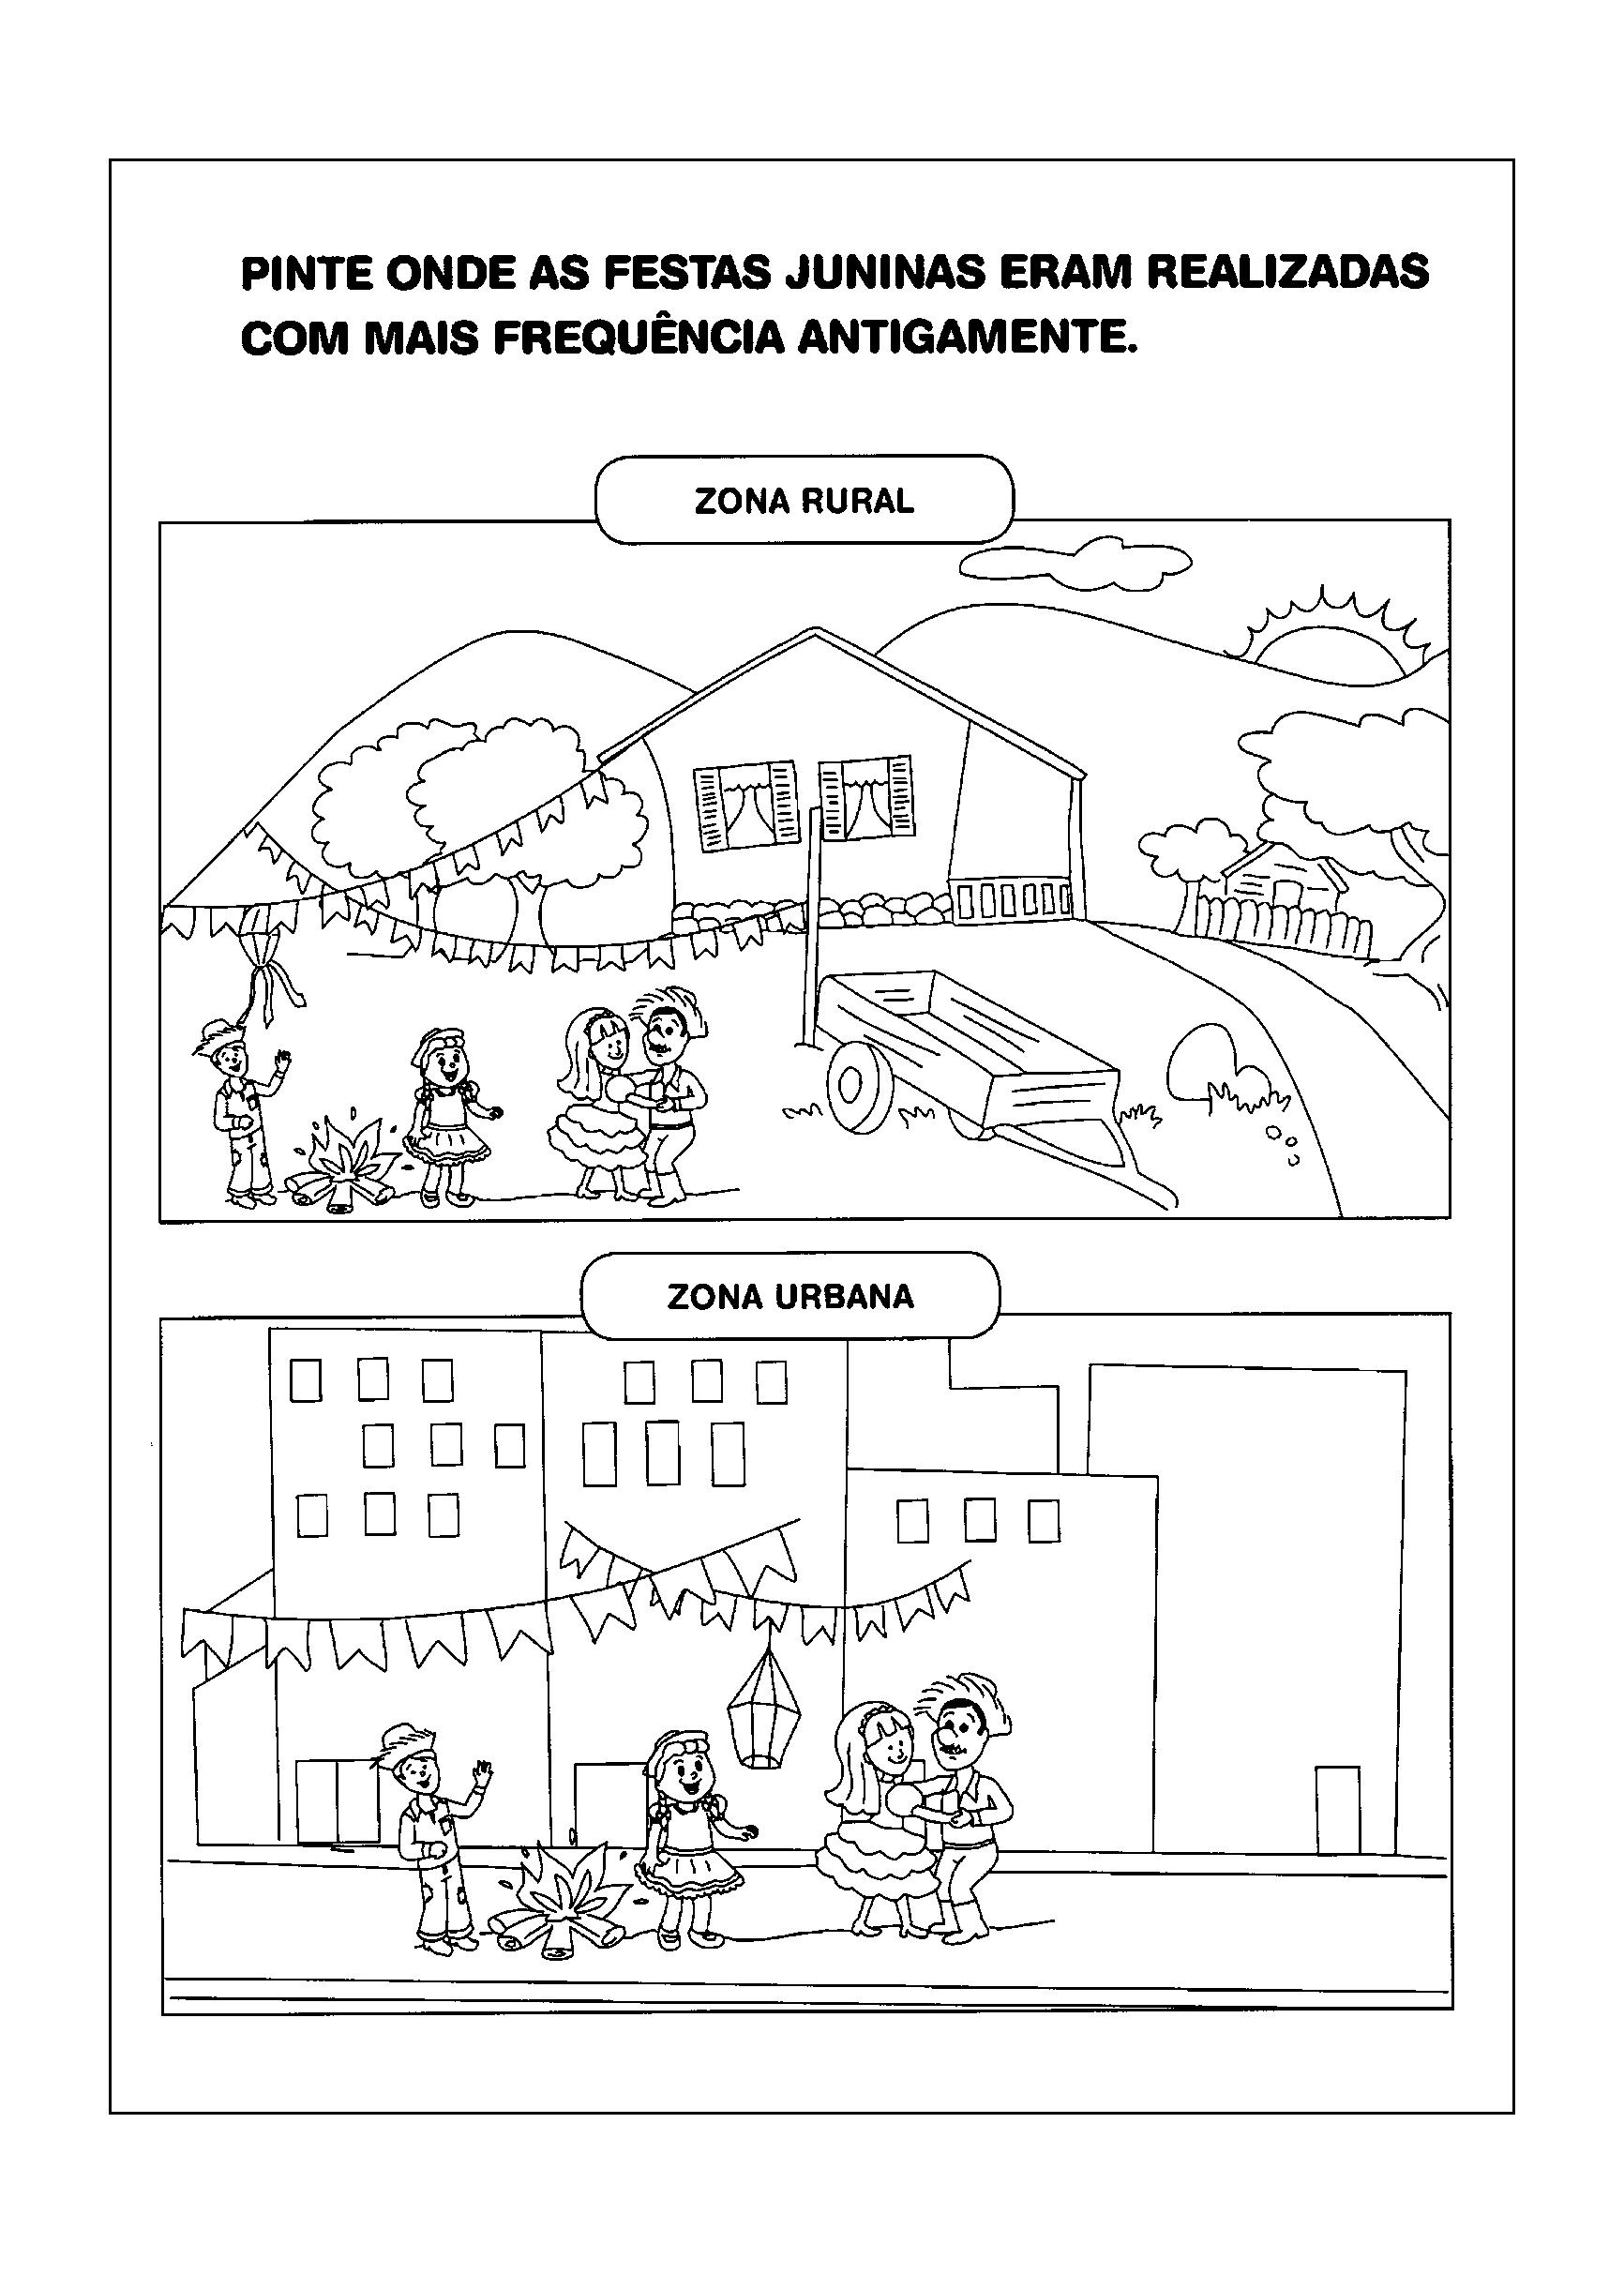 0140-festa-junina-zona-rural-urbana